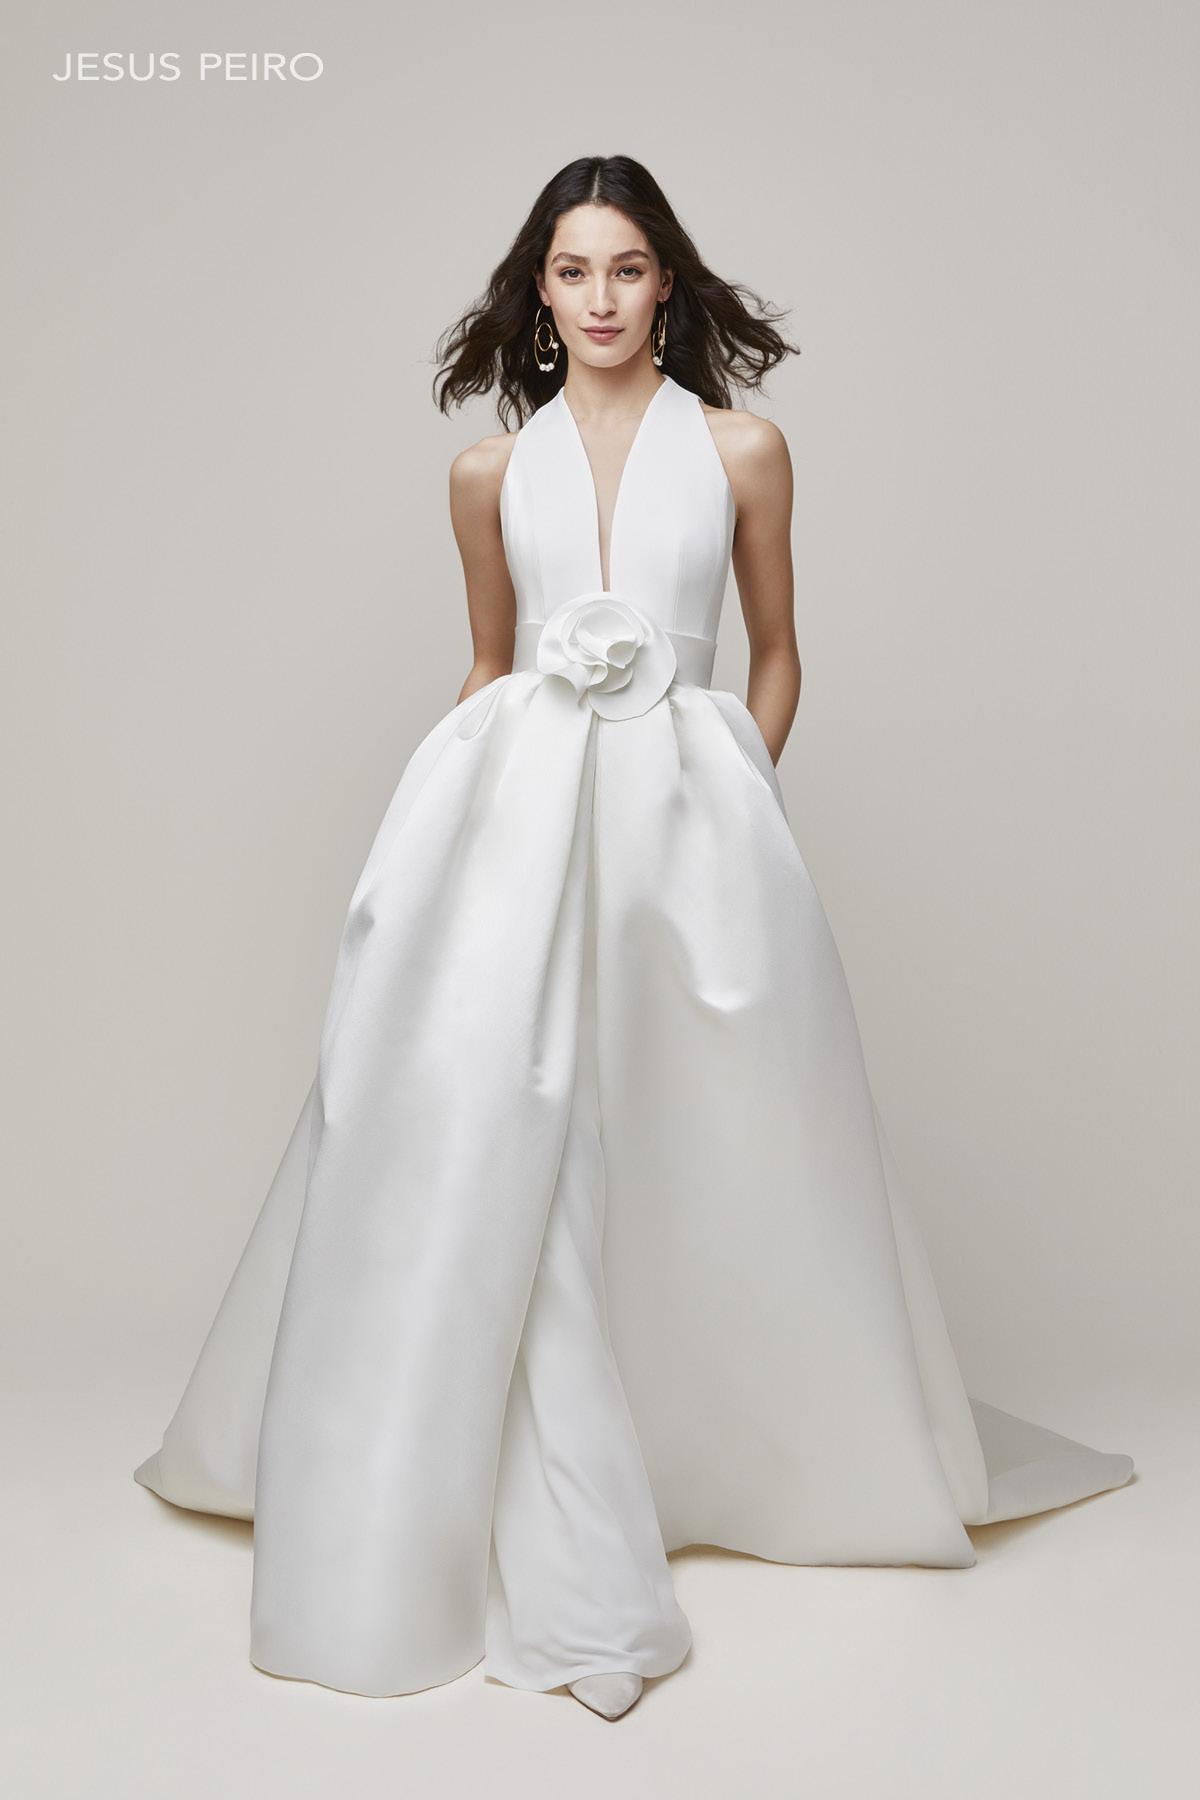 Vestido novia Jesús Peiró Ref.2222